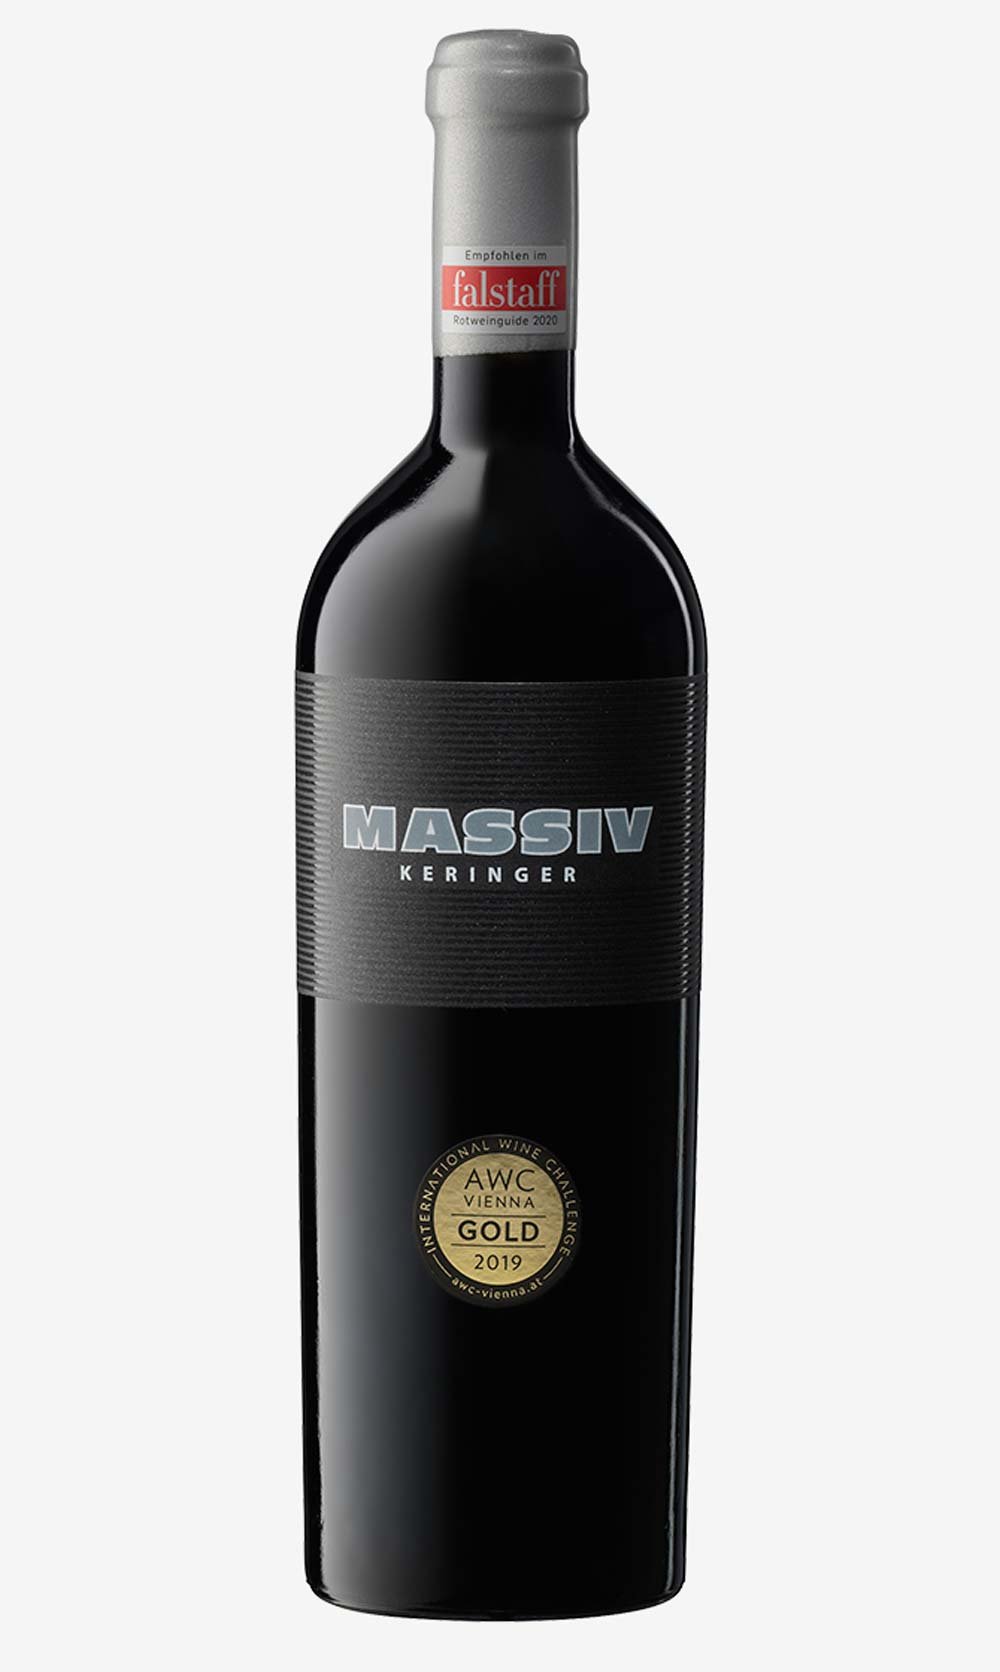 Weinflasche Keringer Massiv Rot